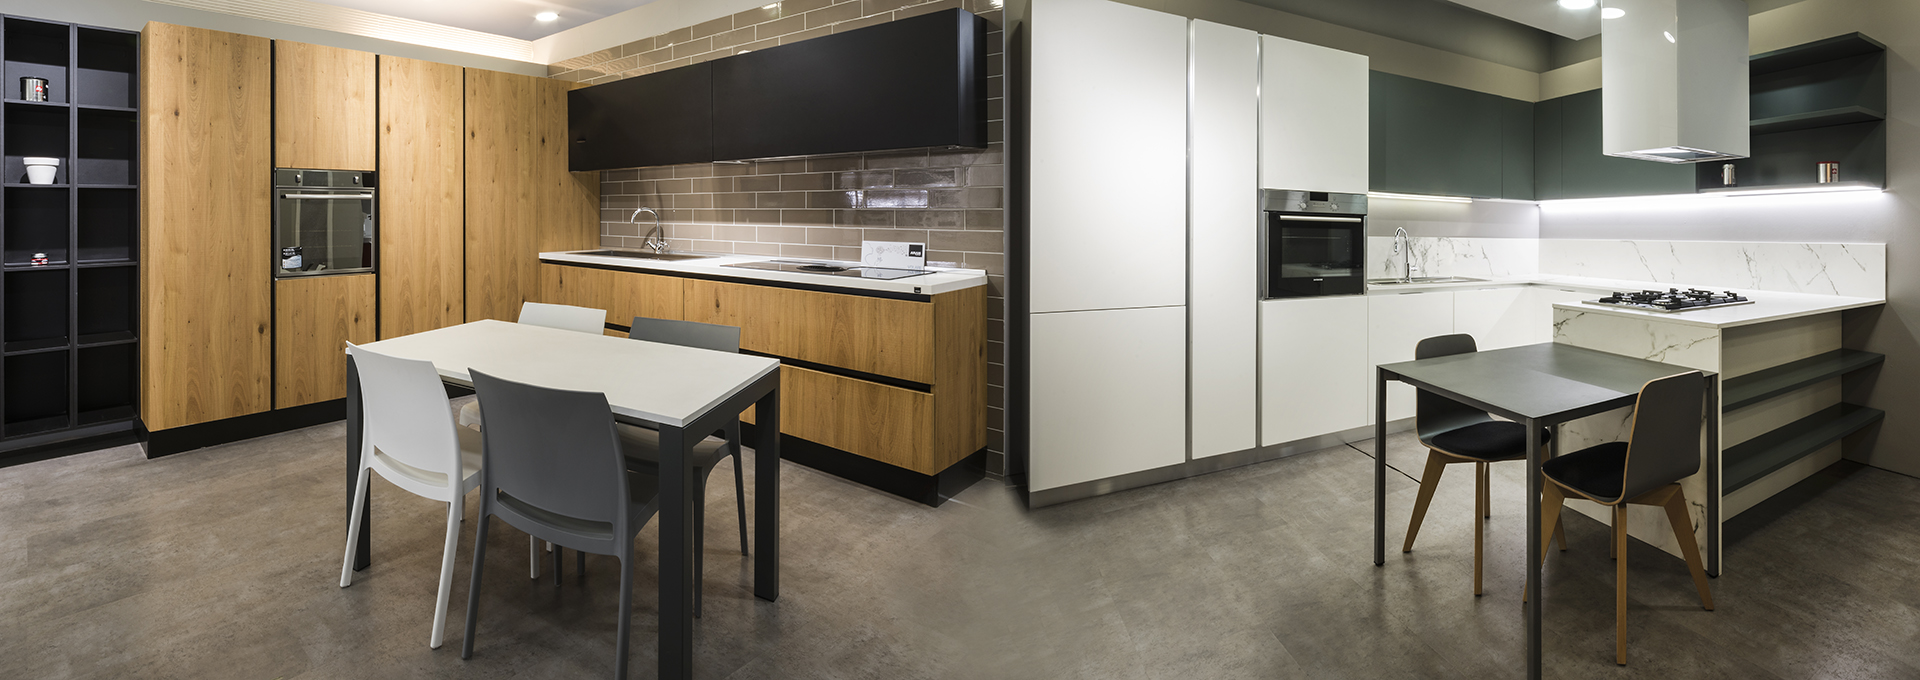 pavimenti-arredobagno-cucine